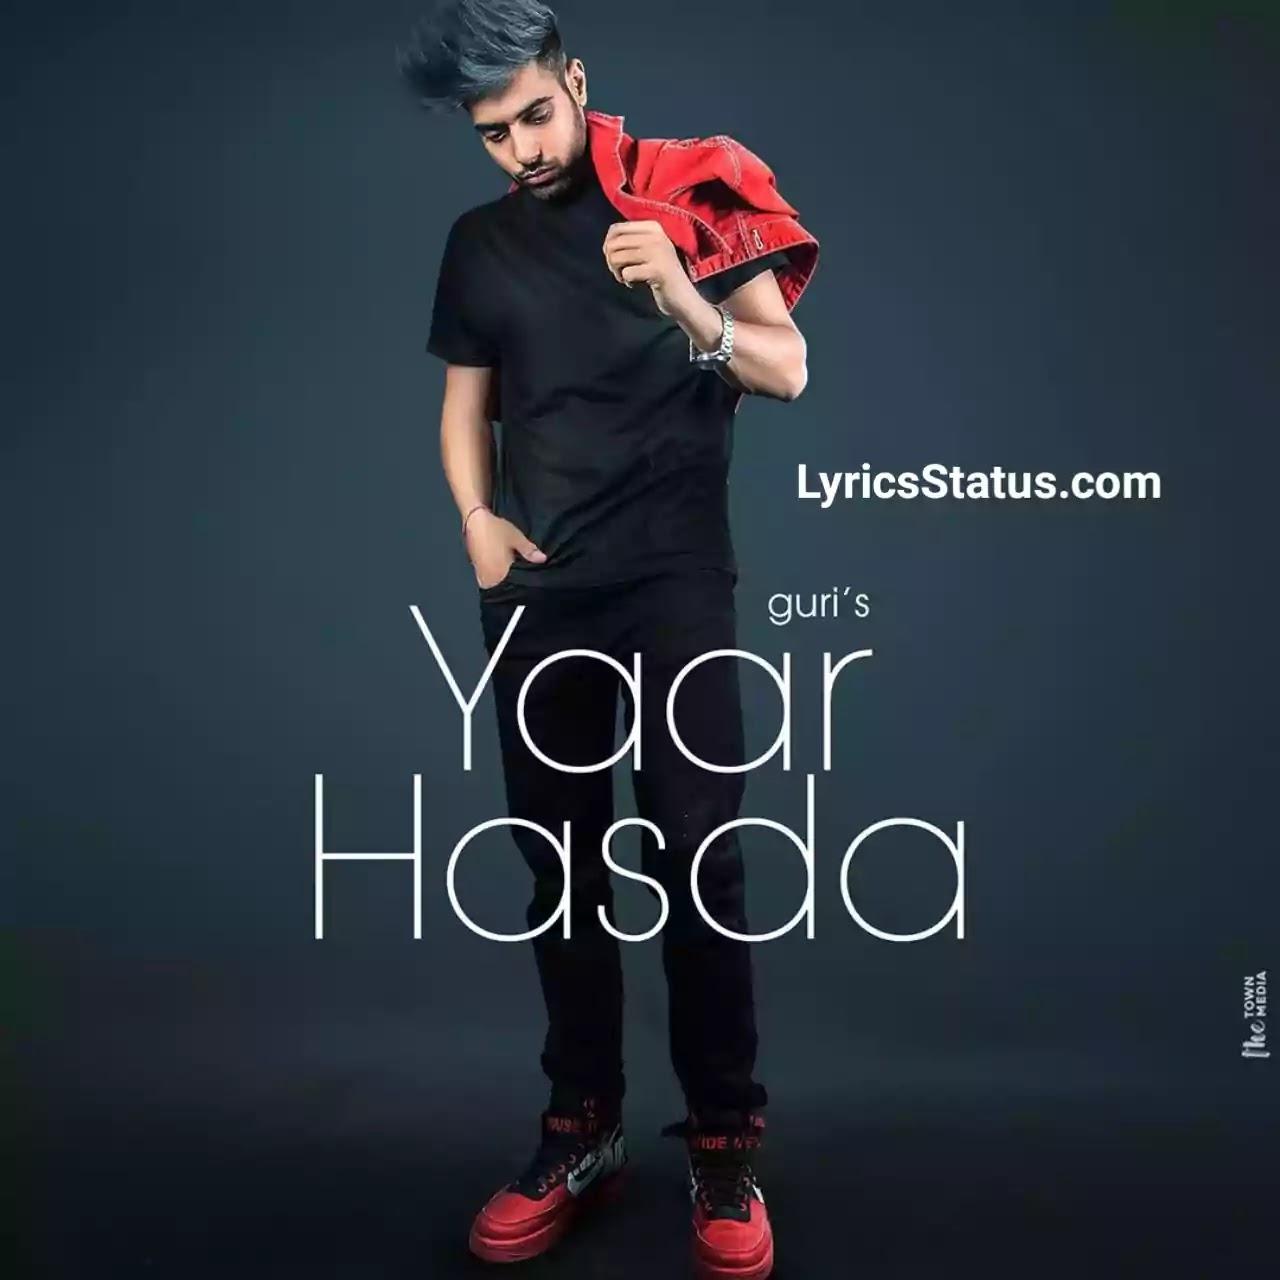 Guri New Song Yaar Hasda Lyrics Status Download Punjabi Song Utton Utton Rehnda Tera Yaar Hasda Par Andron Taan Jal Ke Swaah Ho Gaya